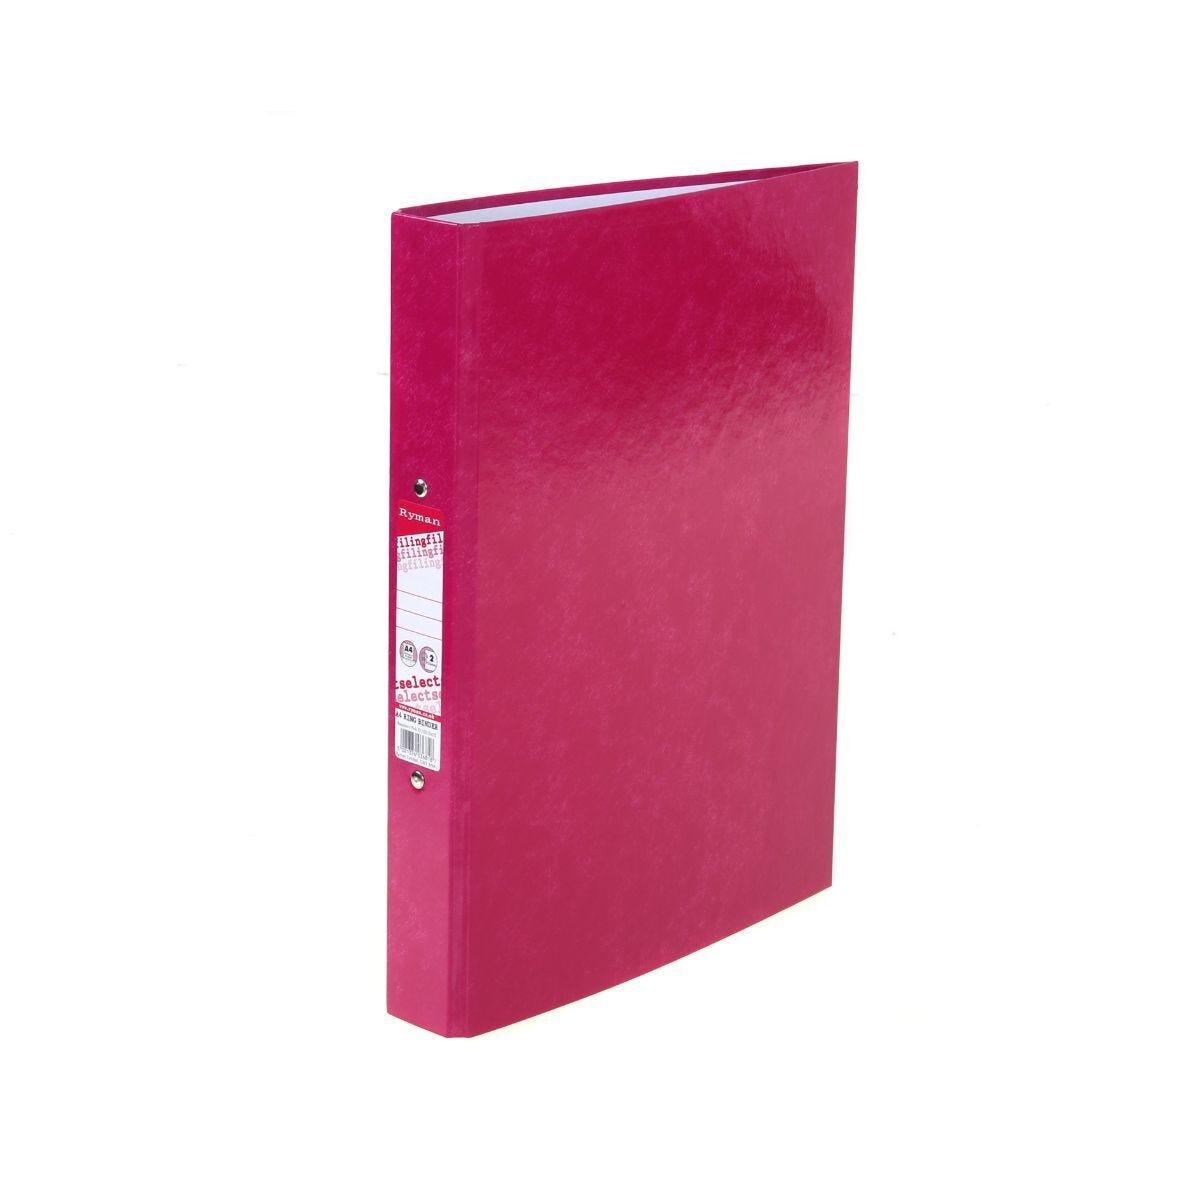 Ryman Select Ringbinder A4 Raspberry Pink